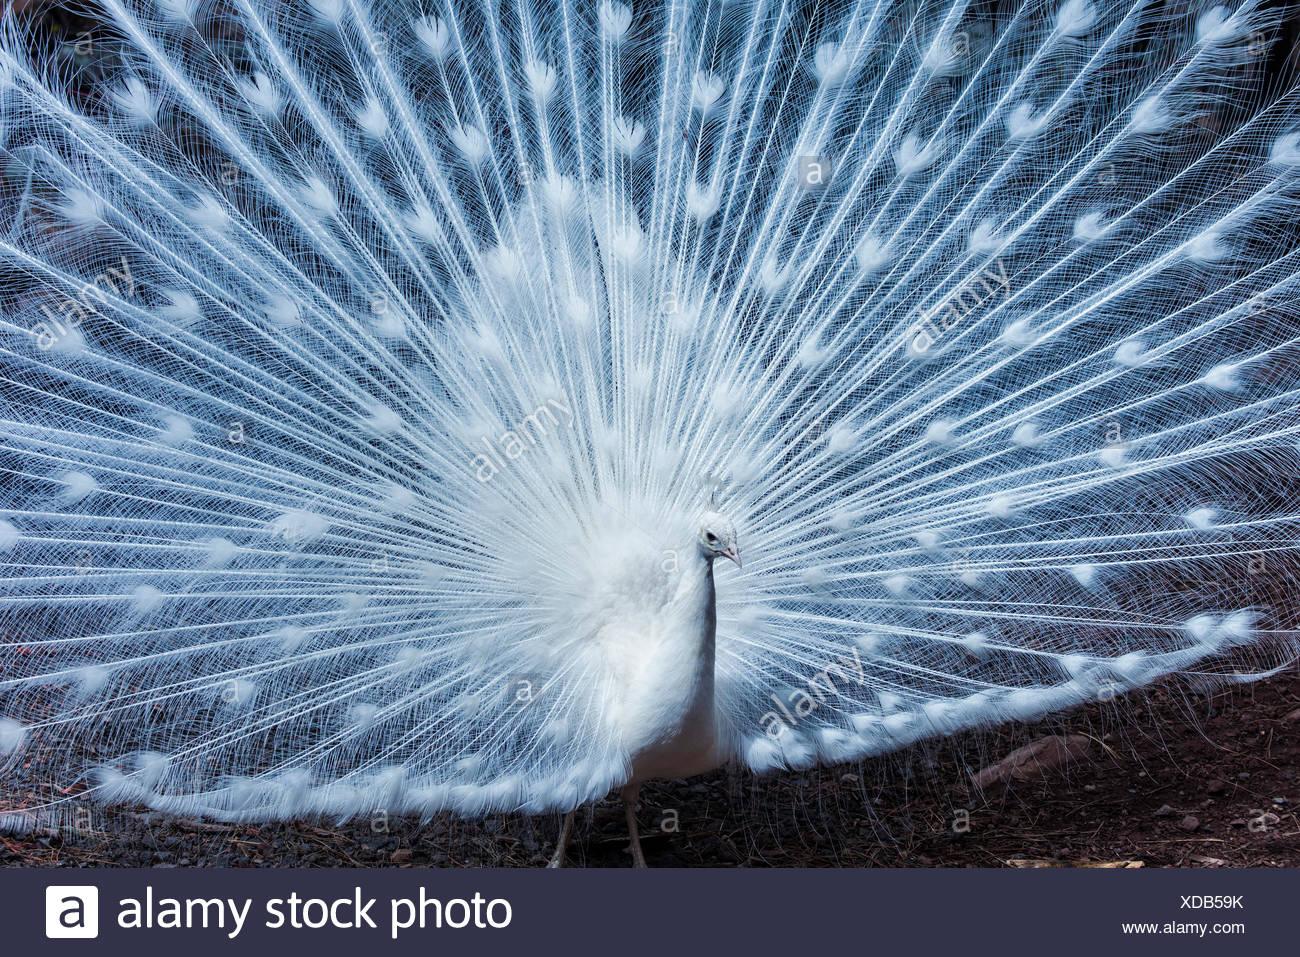 albino peacock, pavo cristatus - Stock Image